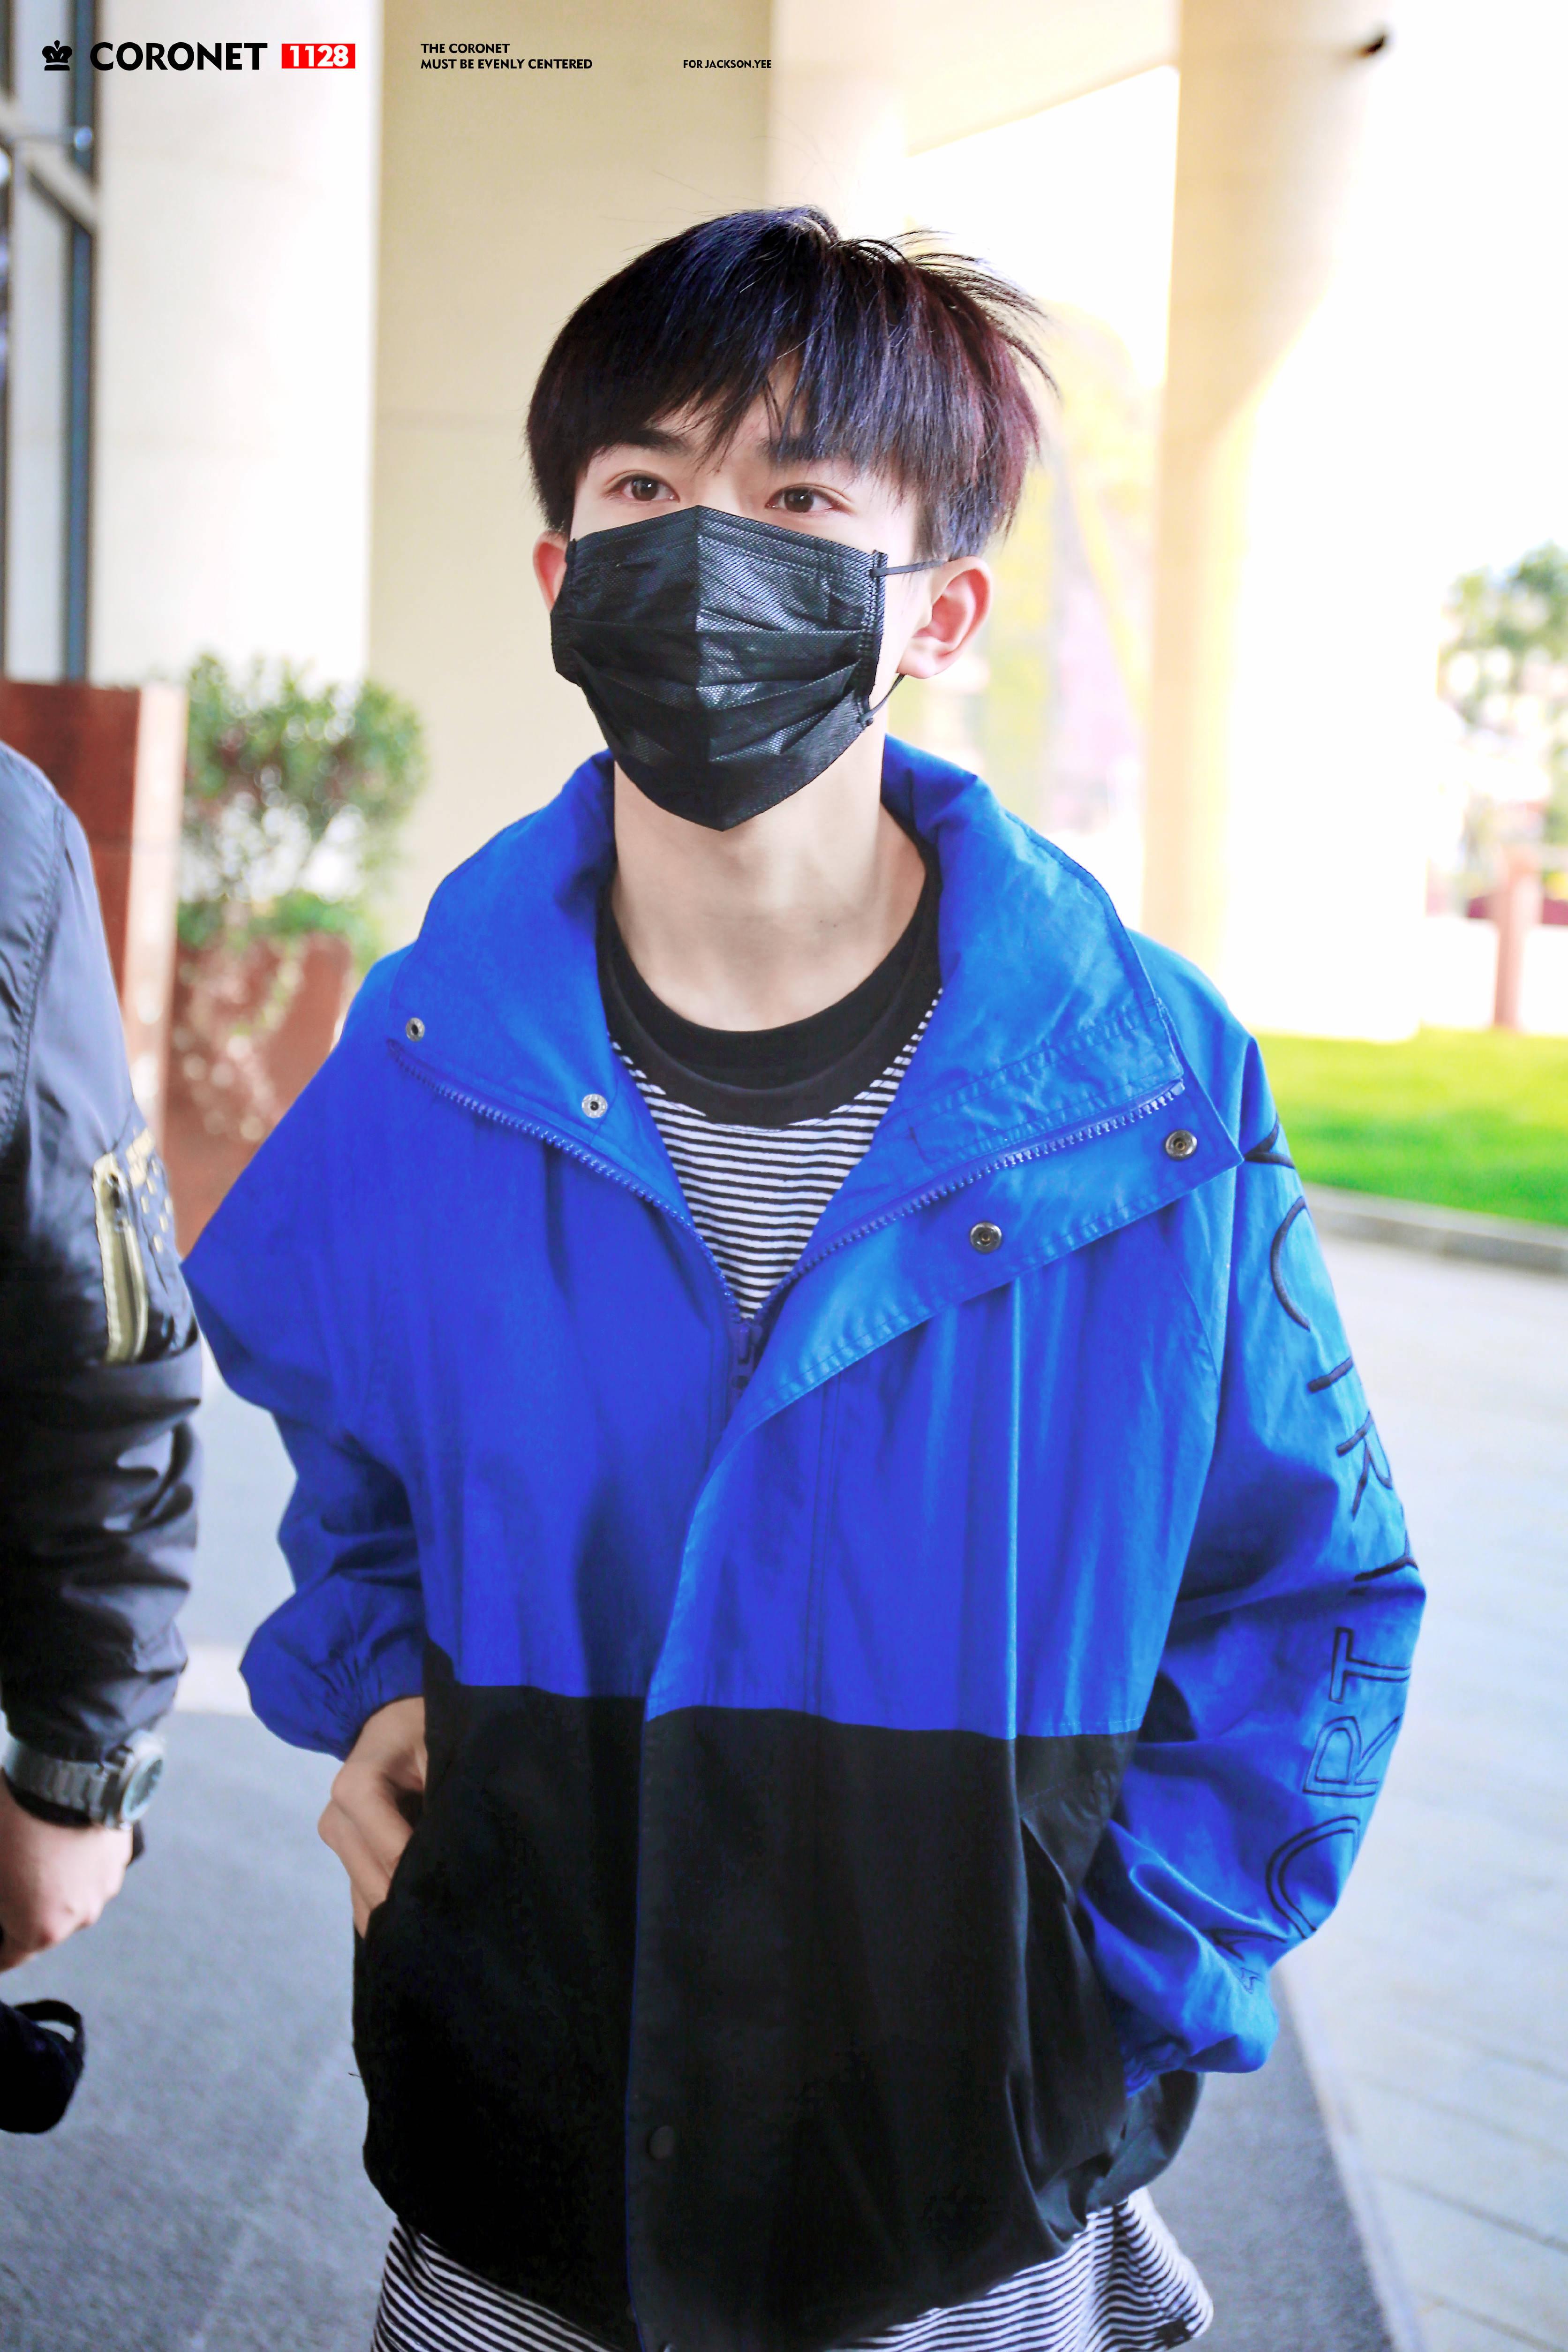 彩虹ICON 10deep Competition jacket 拼接防风衣 夹克 外套